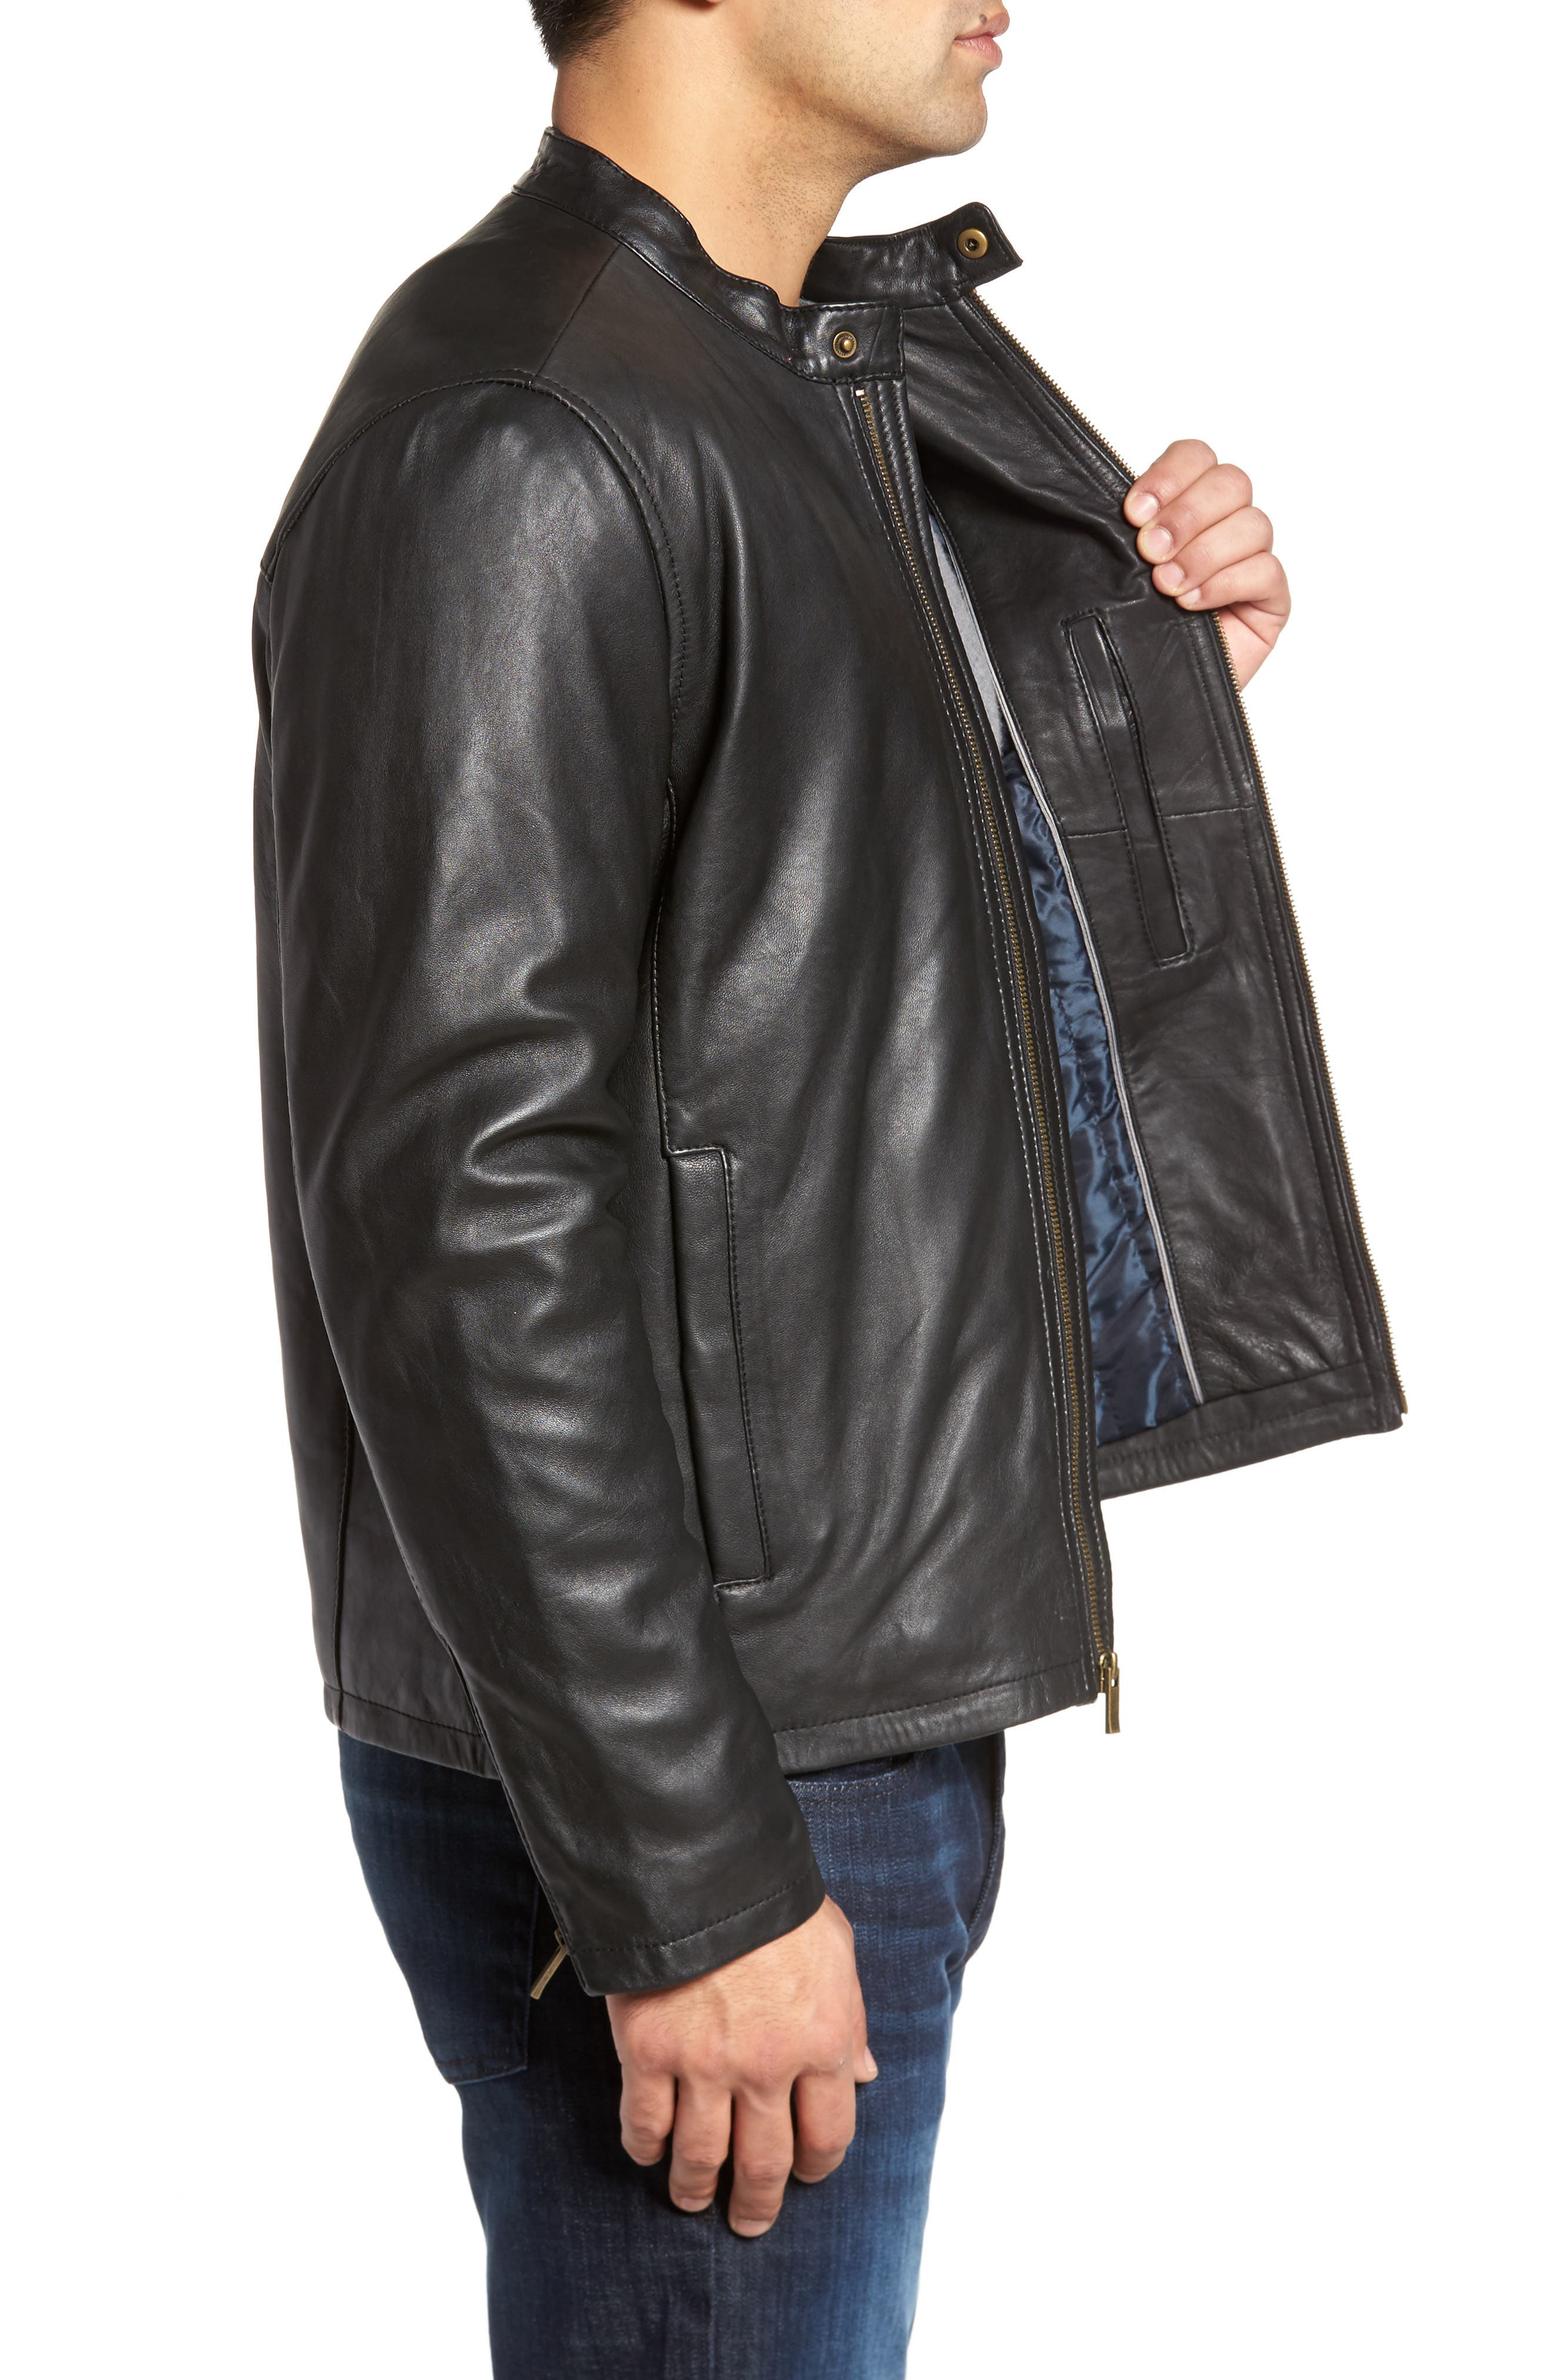 COLE HAAN, Lambskin Leather Moto Jacket, Alternate thumbnail 4, color, 001